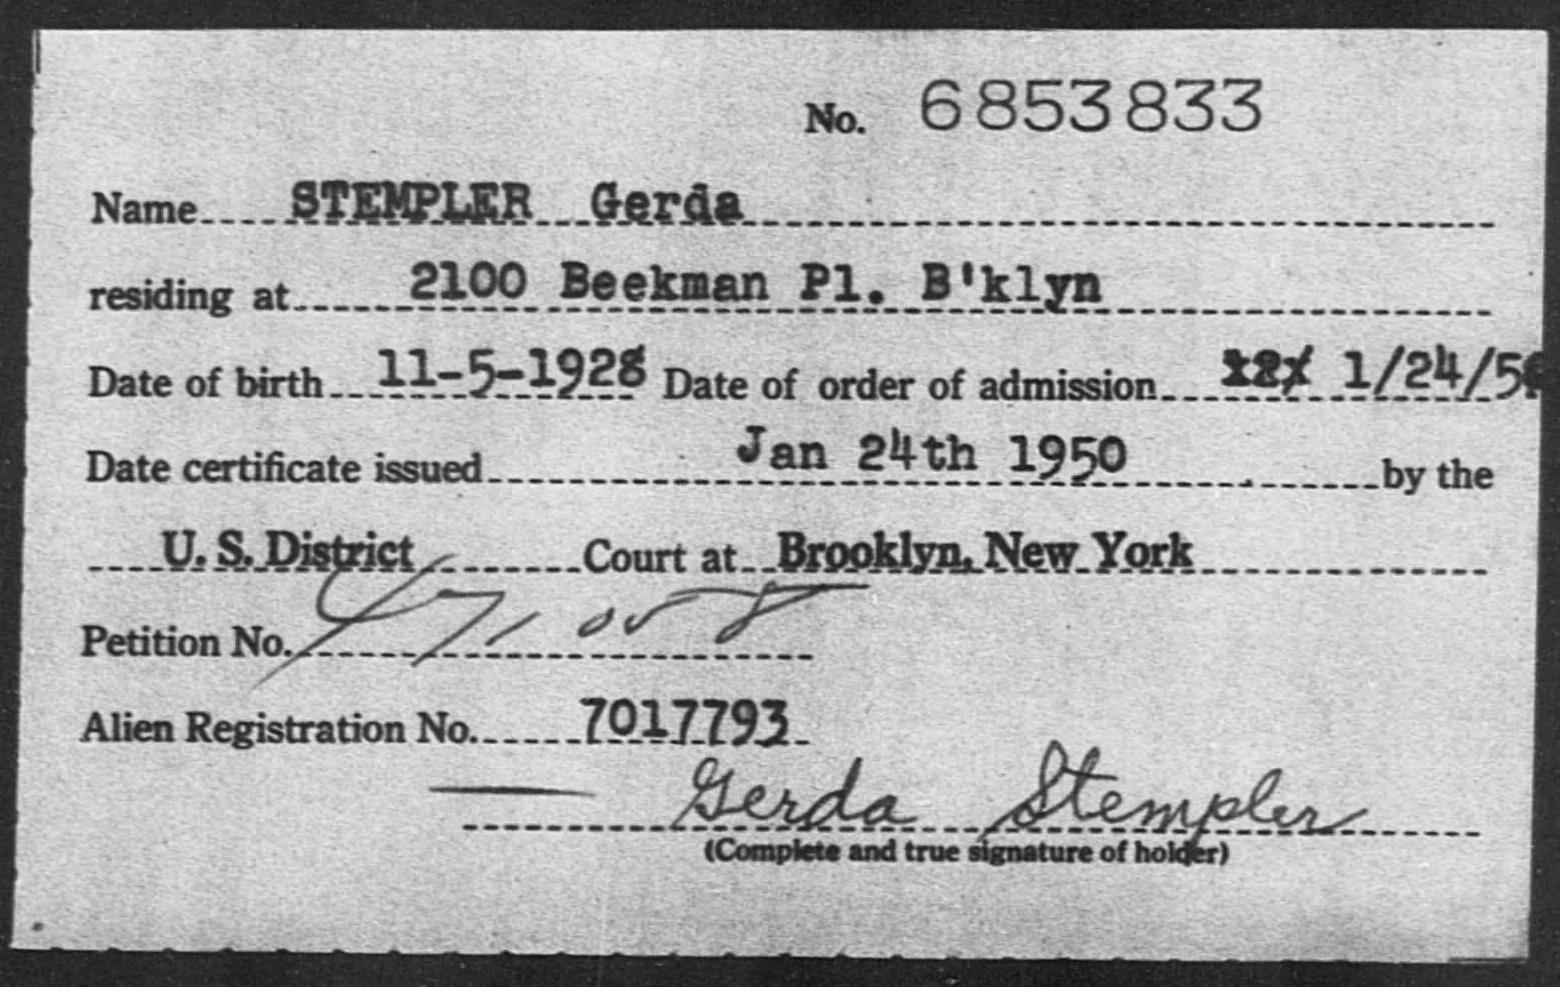 STEMPLER Gerda - Born: 1928, Naturalized: [ILLEGIBLE]